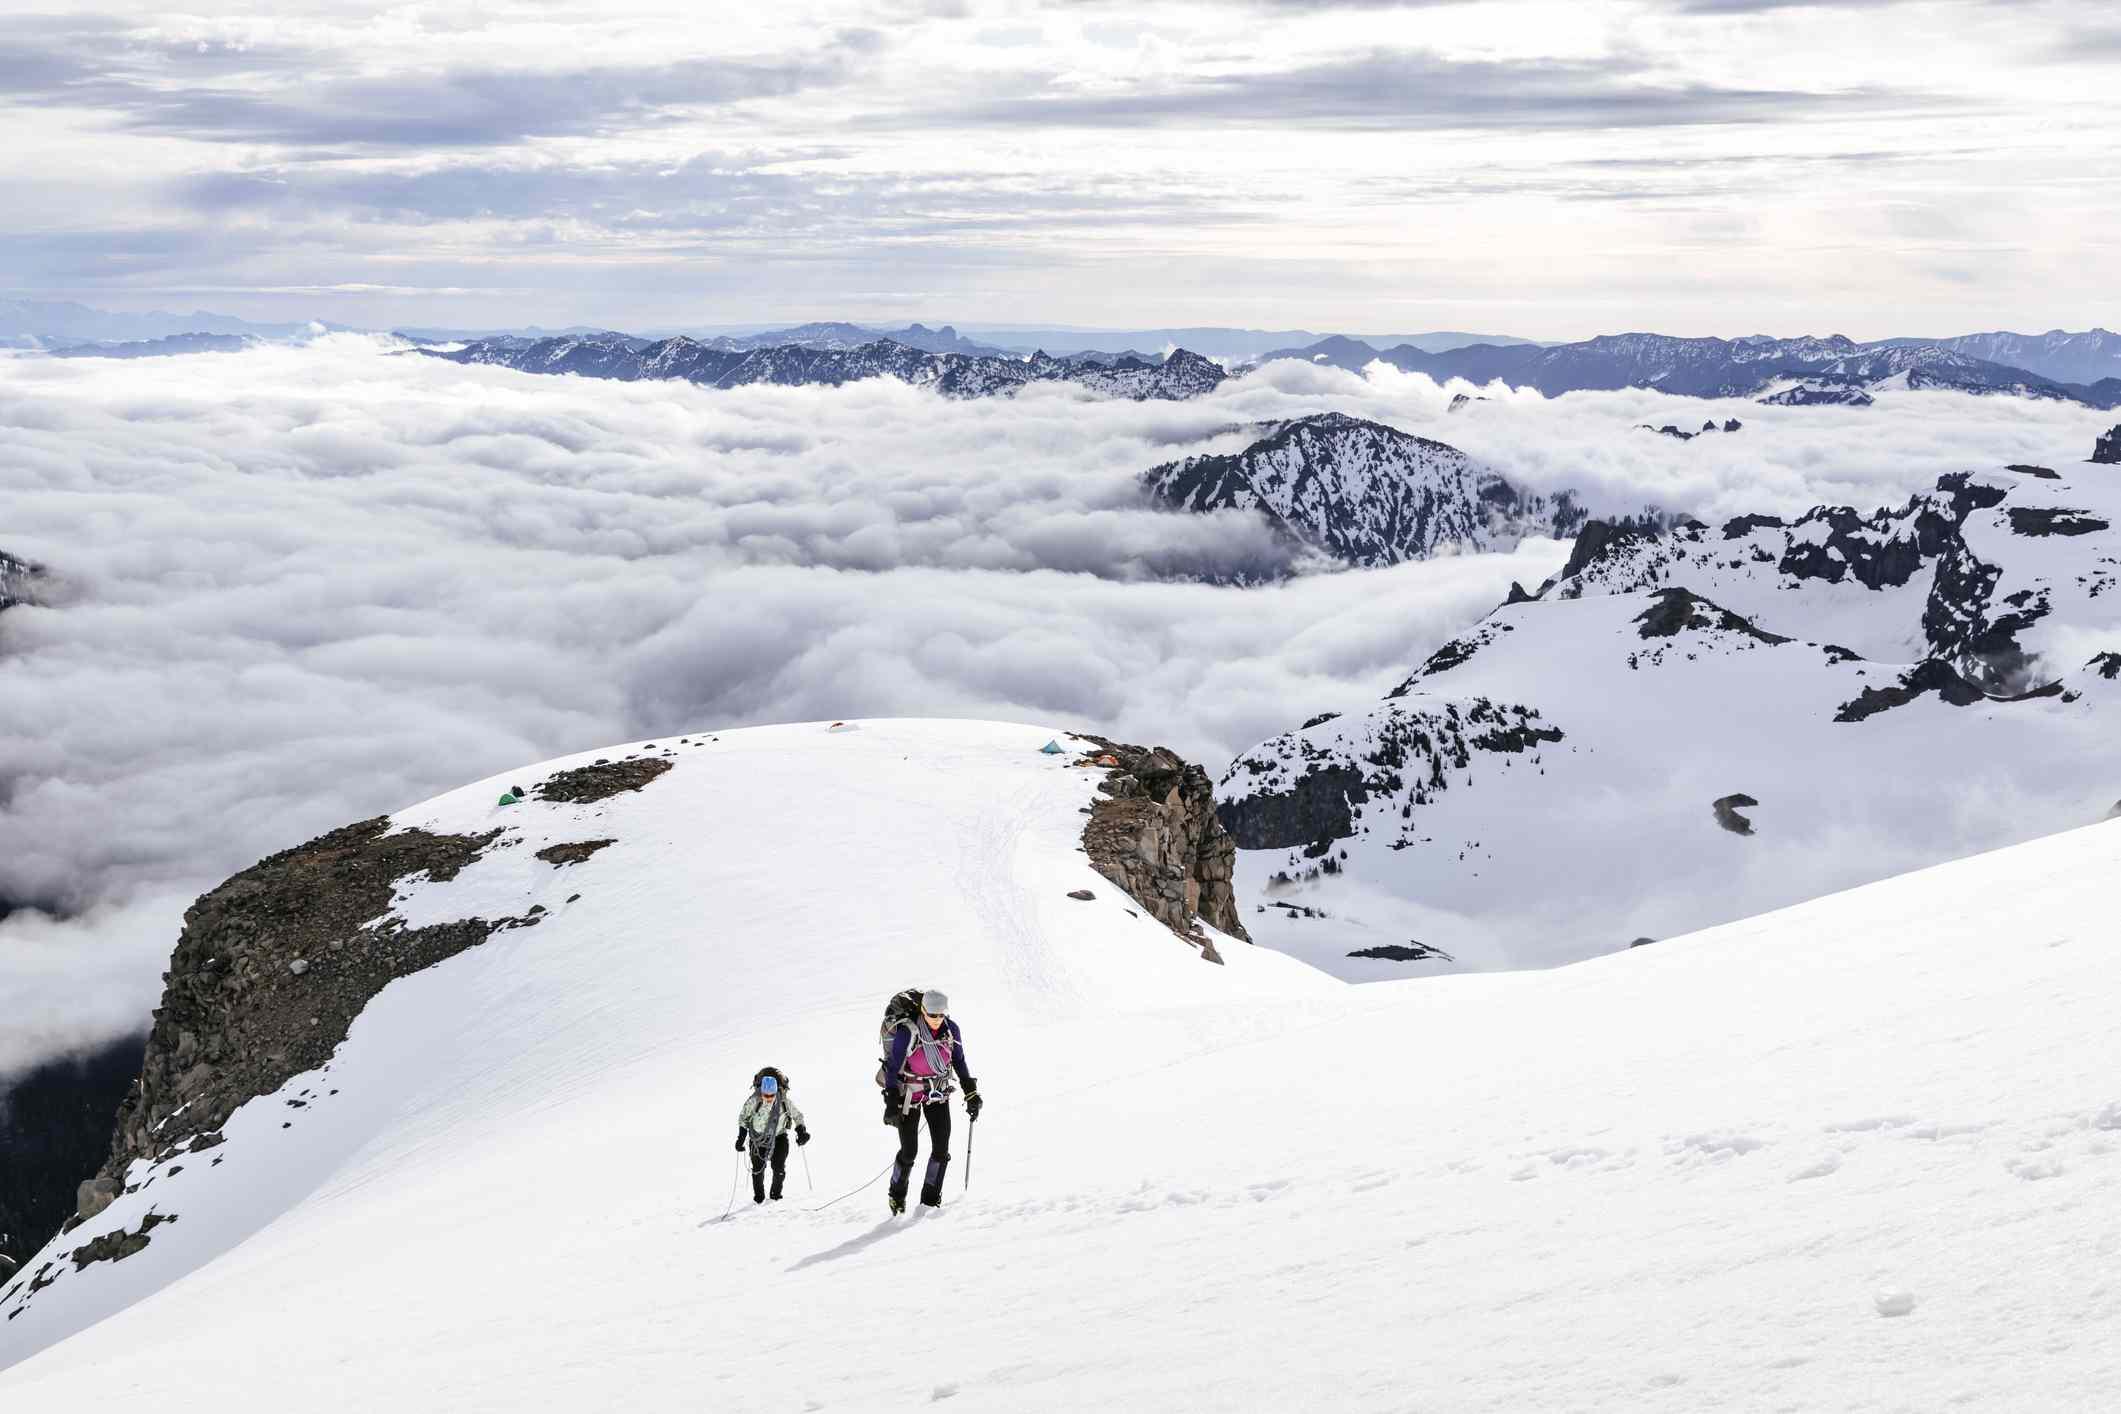 Climbers ascending snowy mountain in Mount Rainier National Park